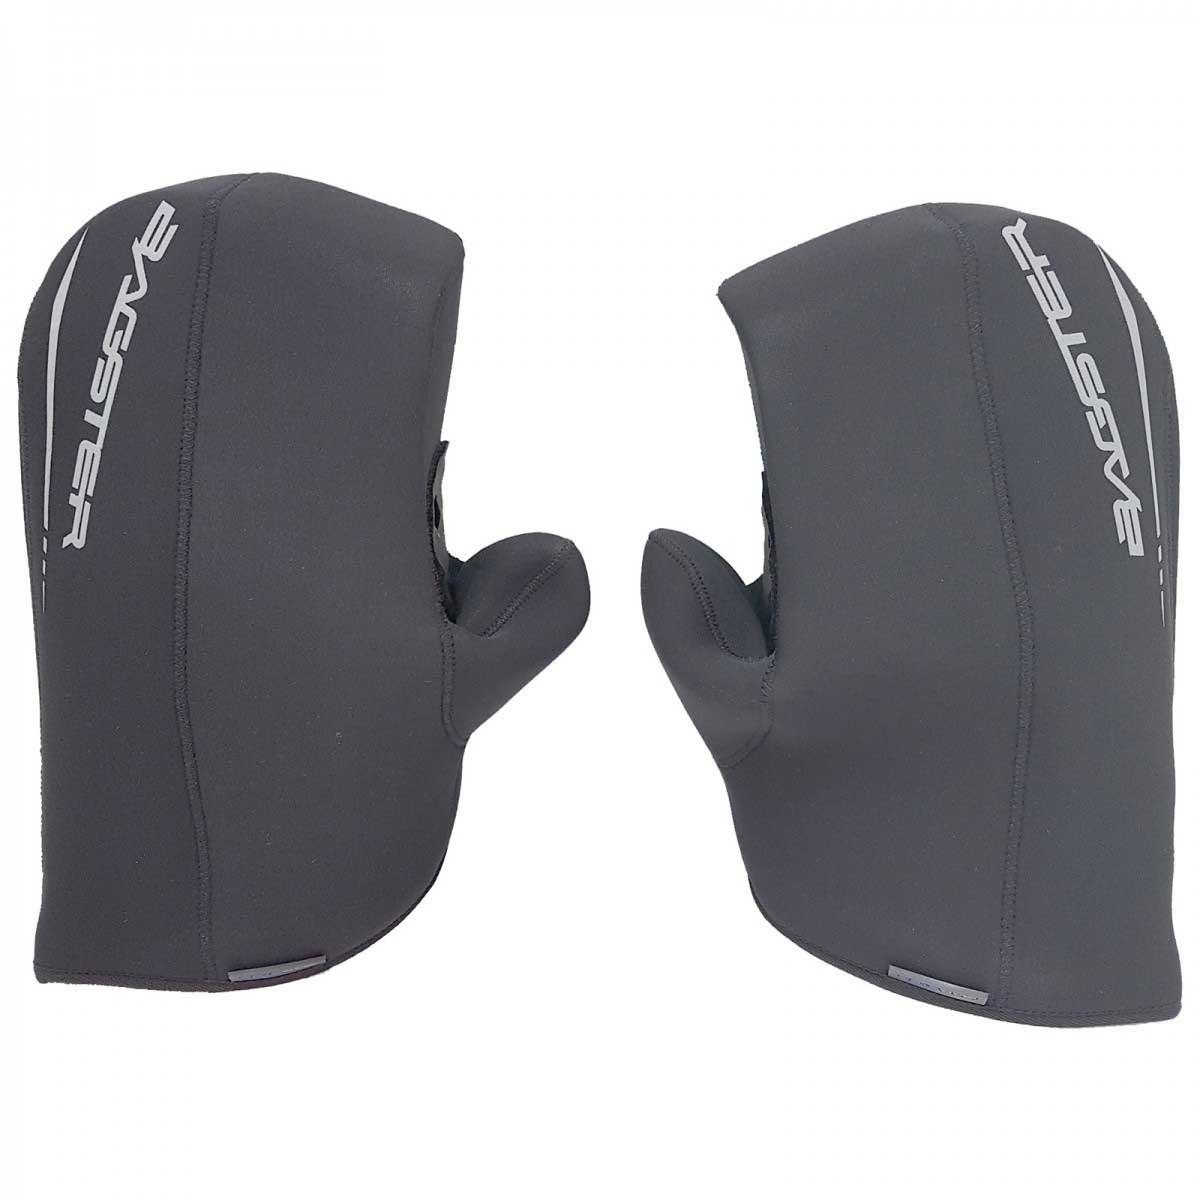 Bagster Premmium Universal Handcuffs Black